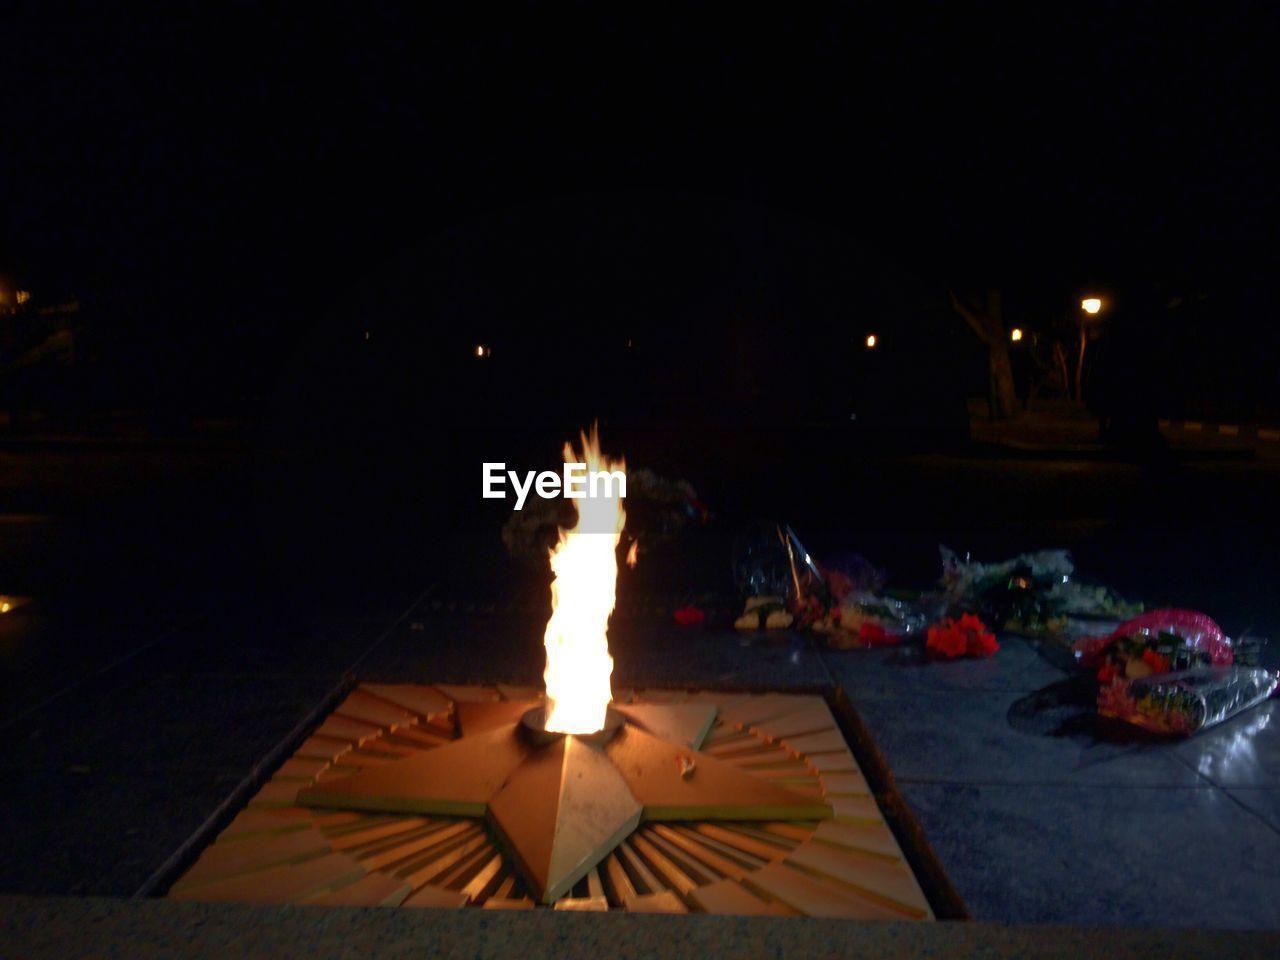 burning, night, flame, illuminated, camping, outdoors, celebration, bonfire, real people, diwali, diya - oil lamp